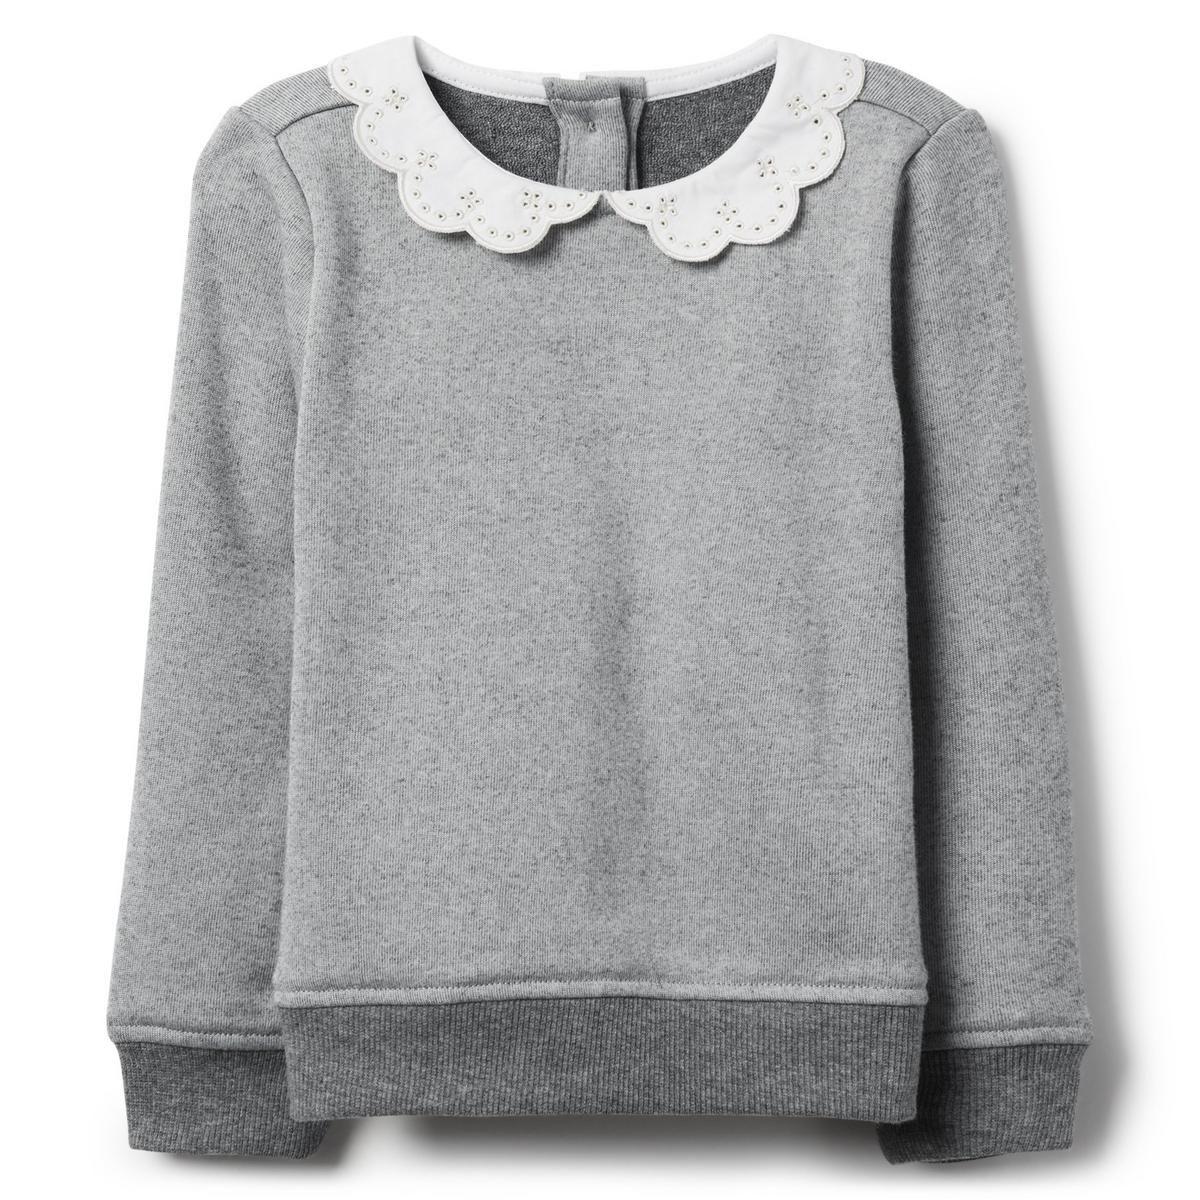 1d11594877c9e9 Eyelet Collar Sweatshirt | baby shopping list | Collared sweatshirt ...